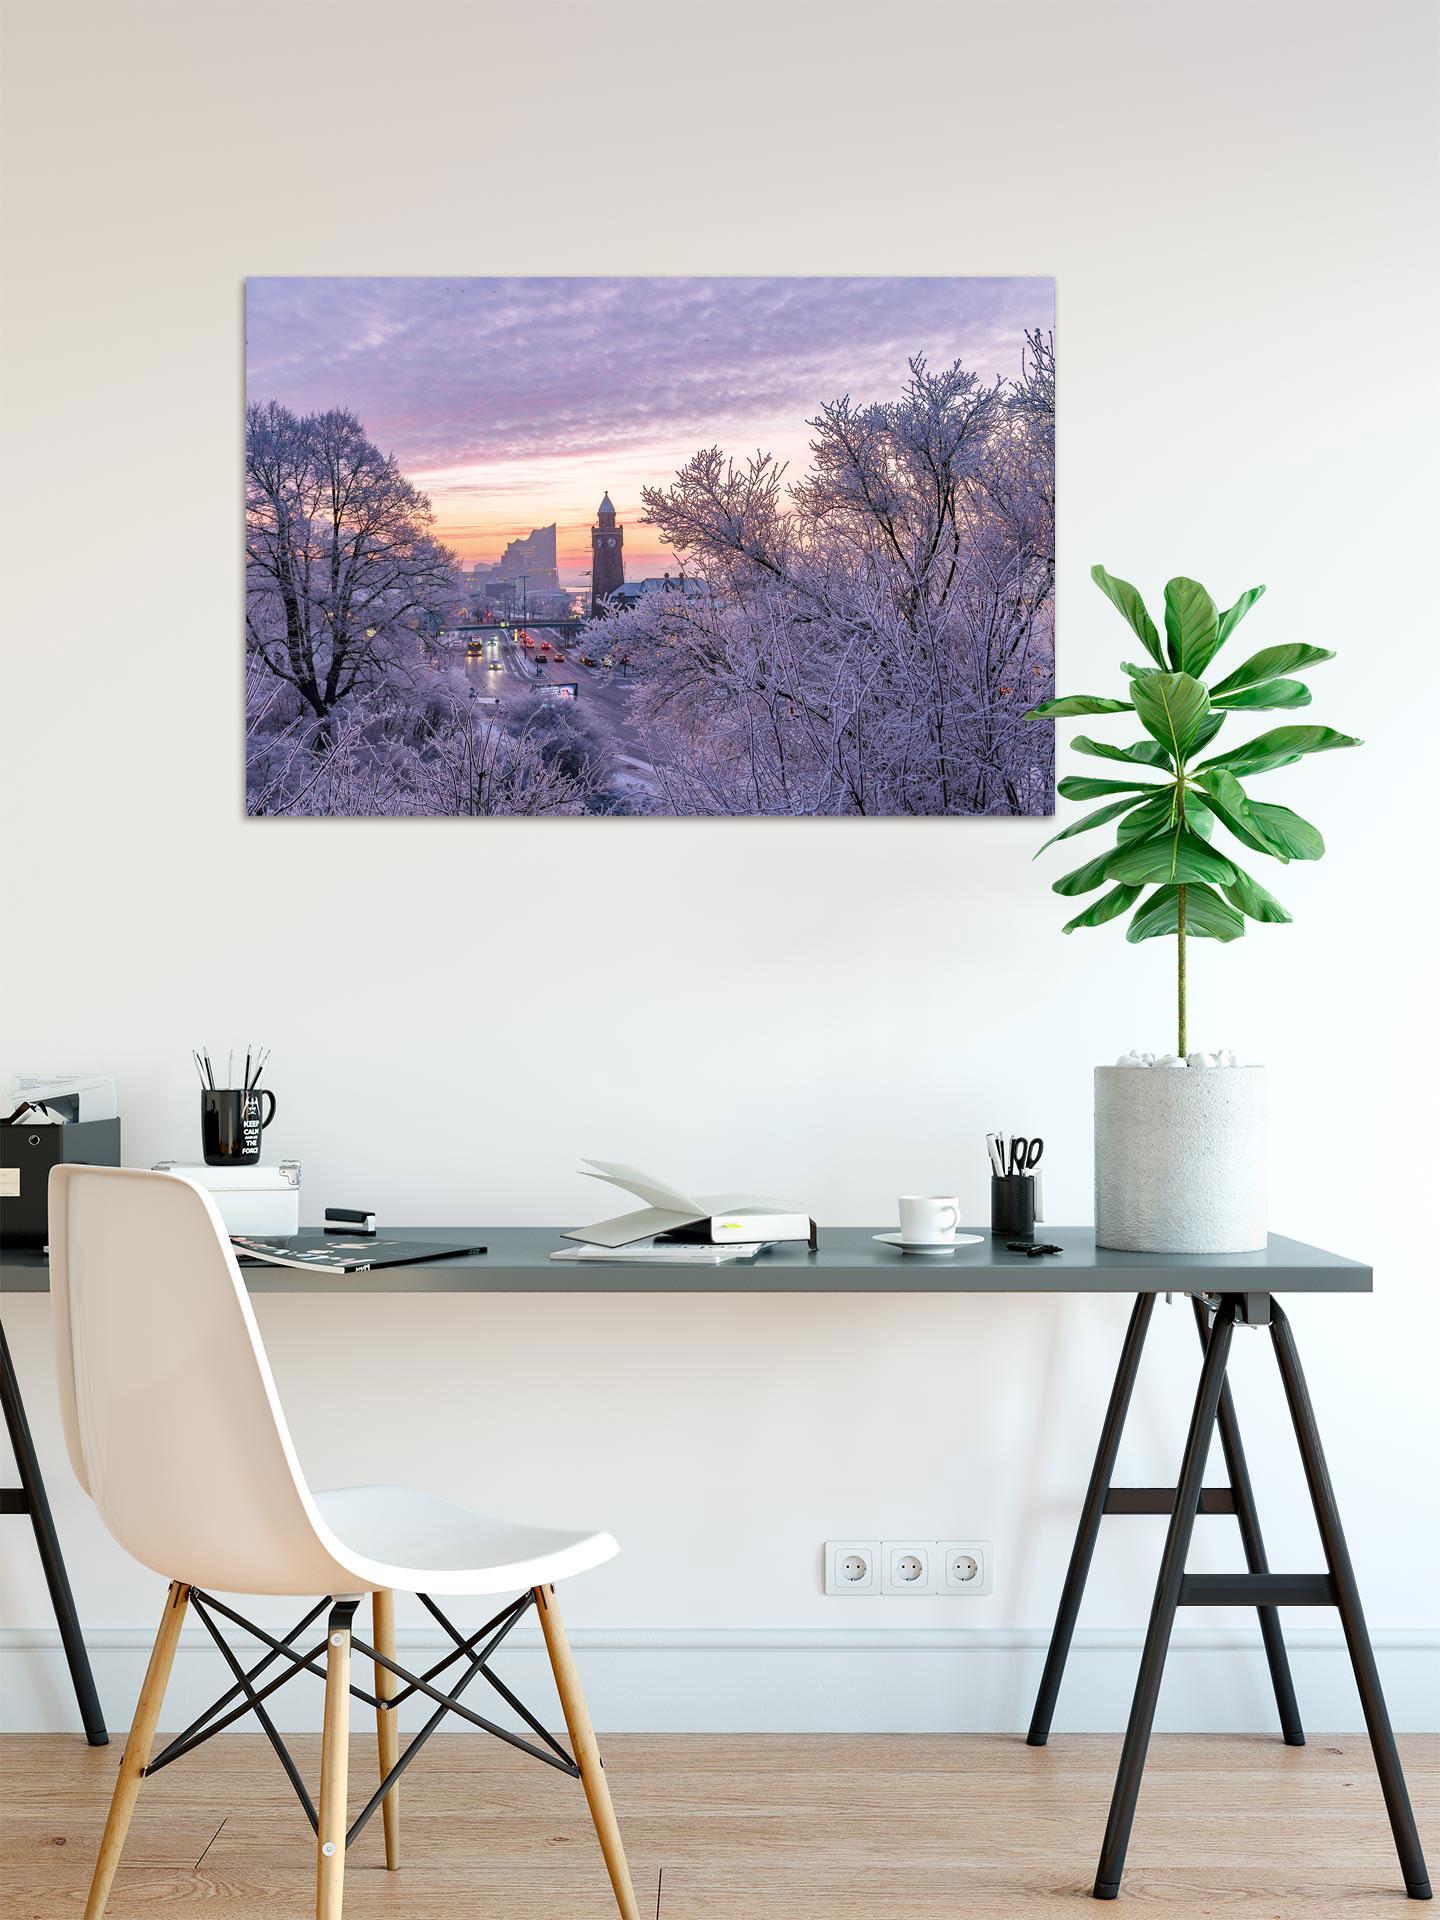 NL086-wintermaerchen-hamburg-wandbild-bild-auf-leinwand-acrylglas-aludibond-arbeitszimmer